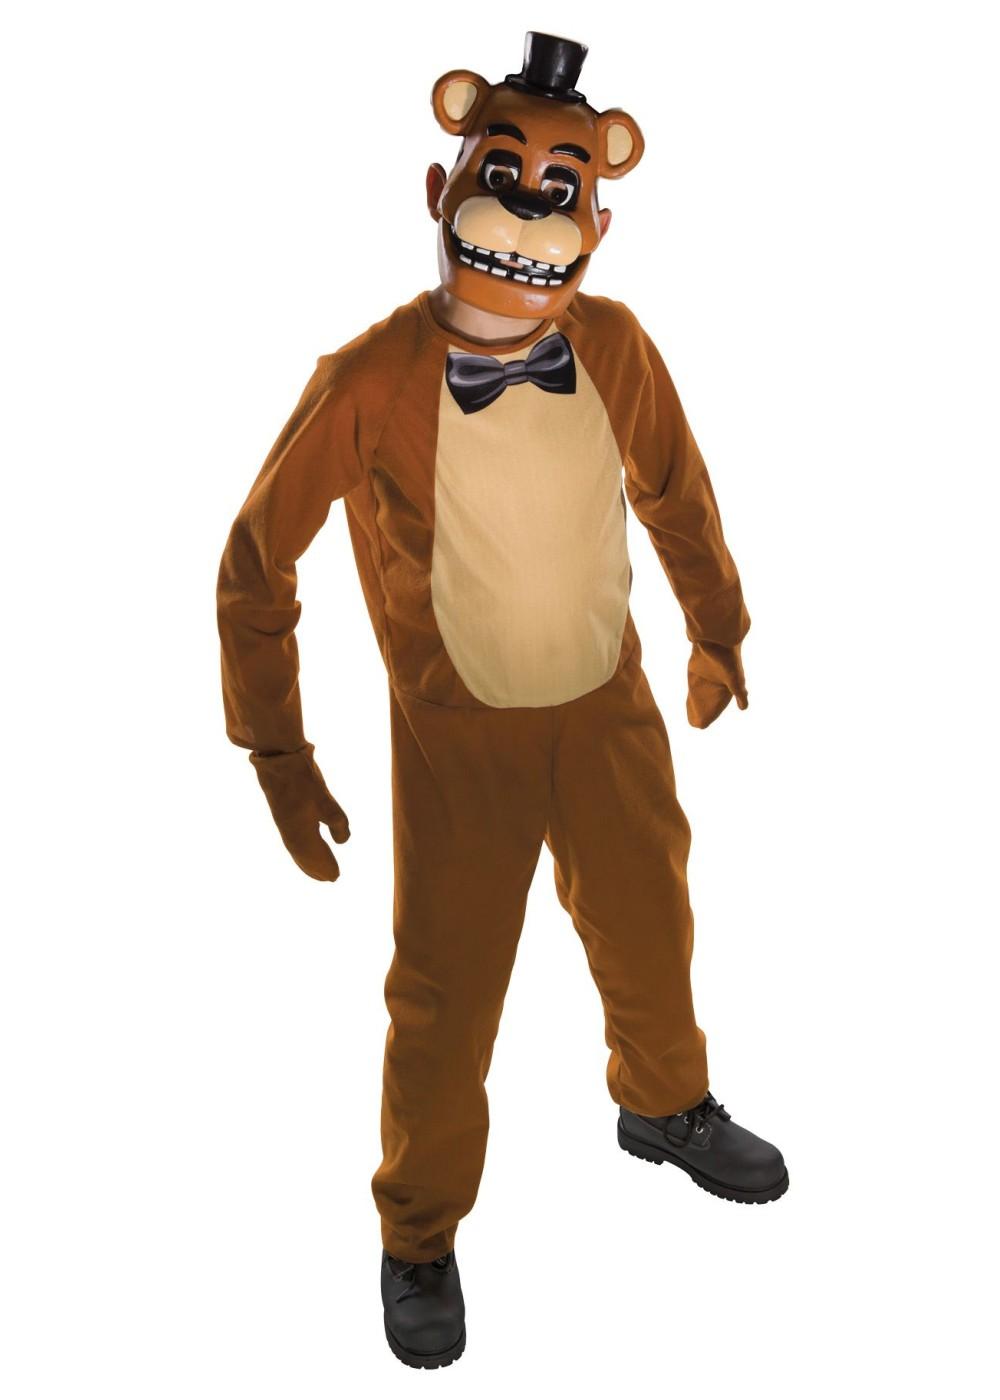 Kids Freddy Fazbear Costume Video Game Costumes